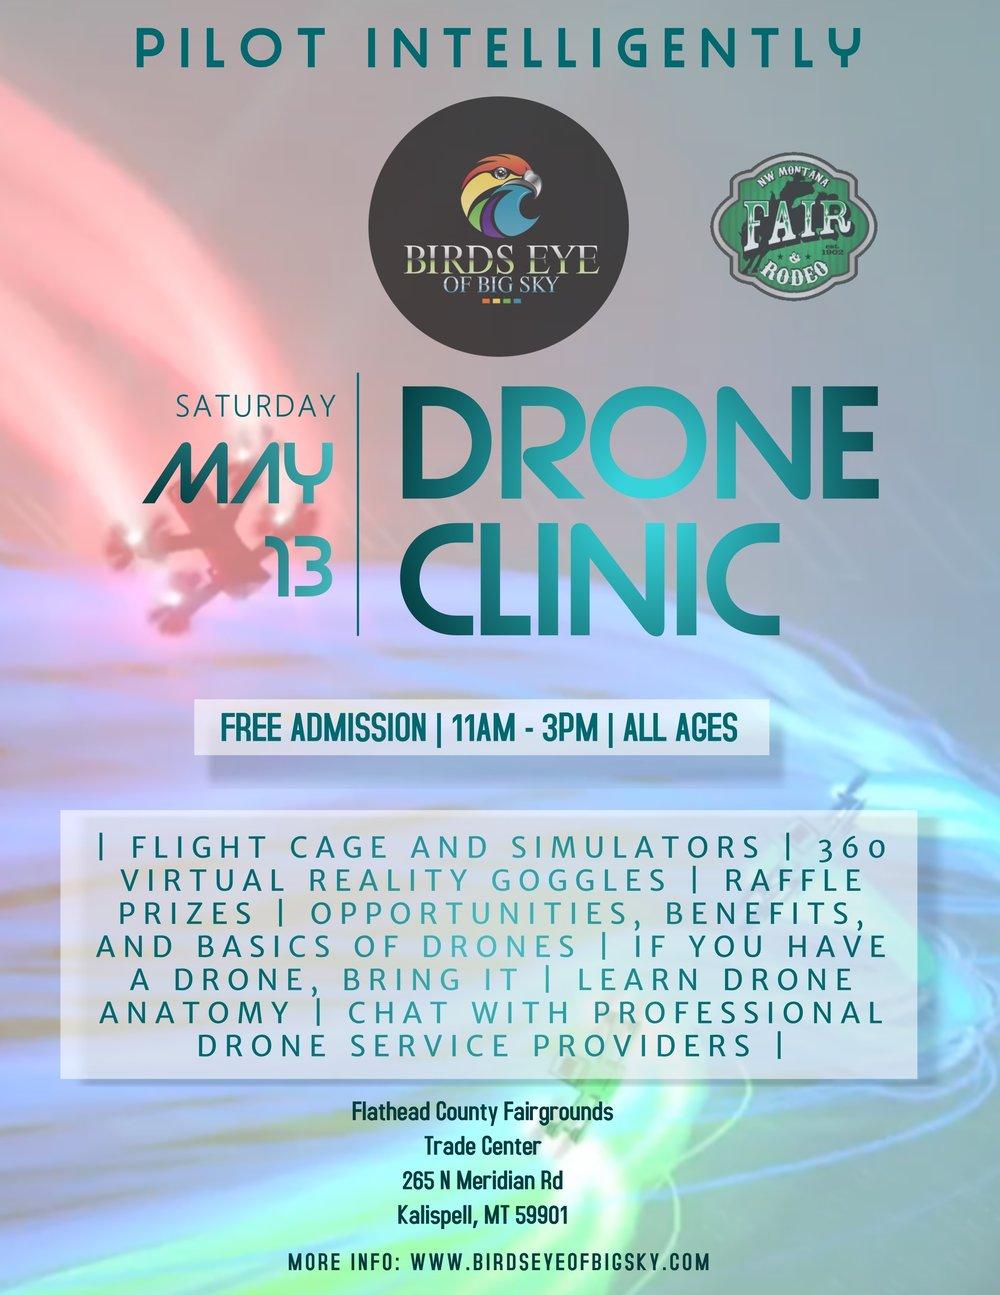 MT DRONE CLINICS